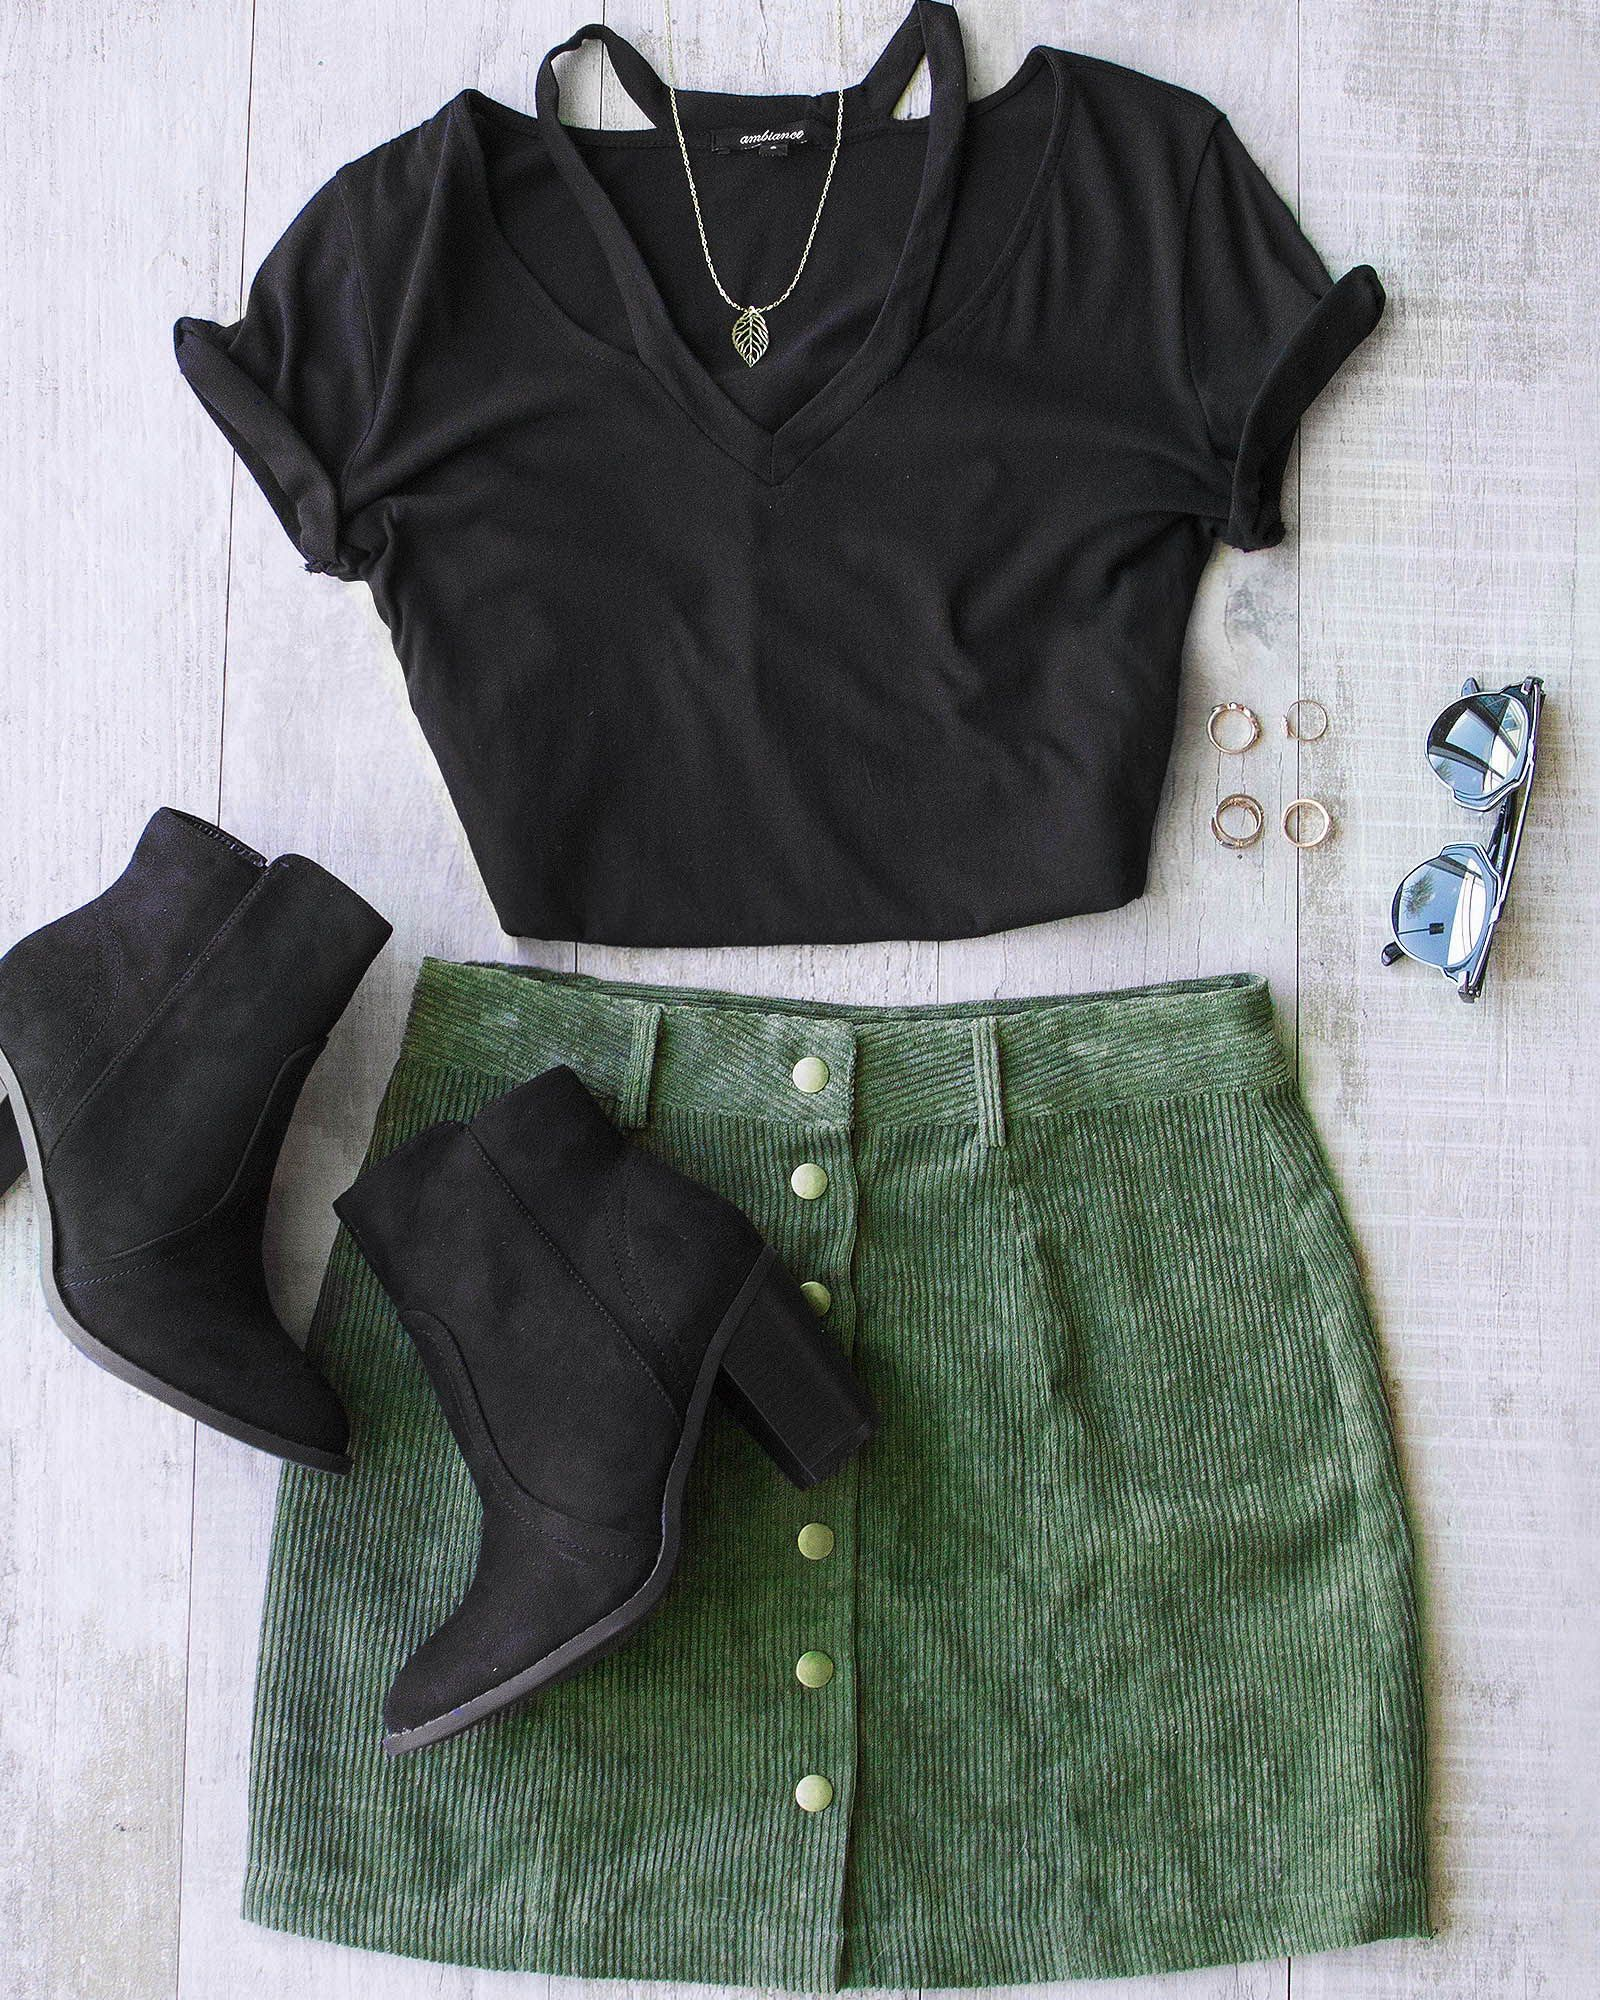 the latest fb9bb 18909 Kessa Top #shoppriceless   Mode   Kleidung, Mode outfits und ...